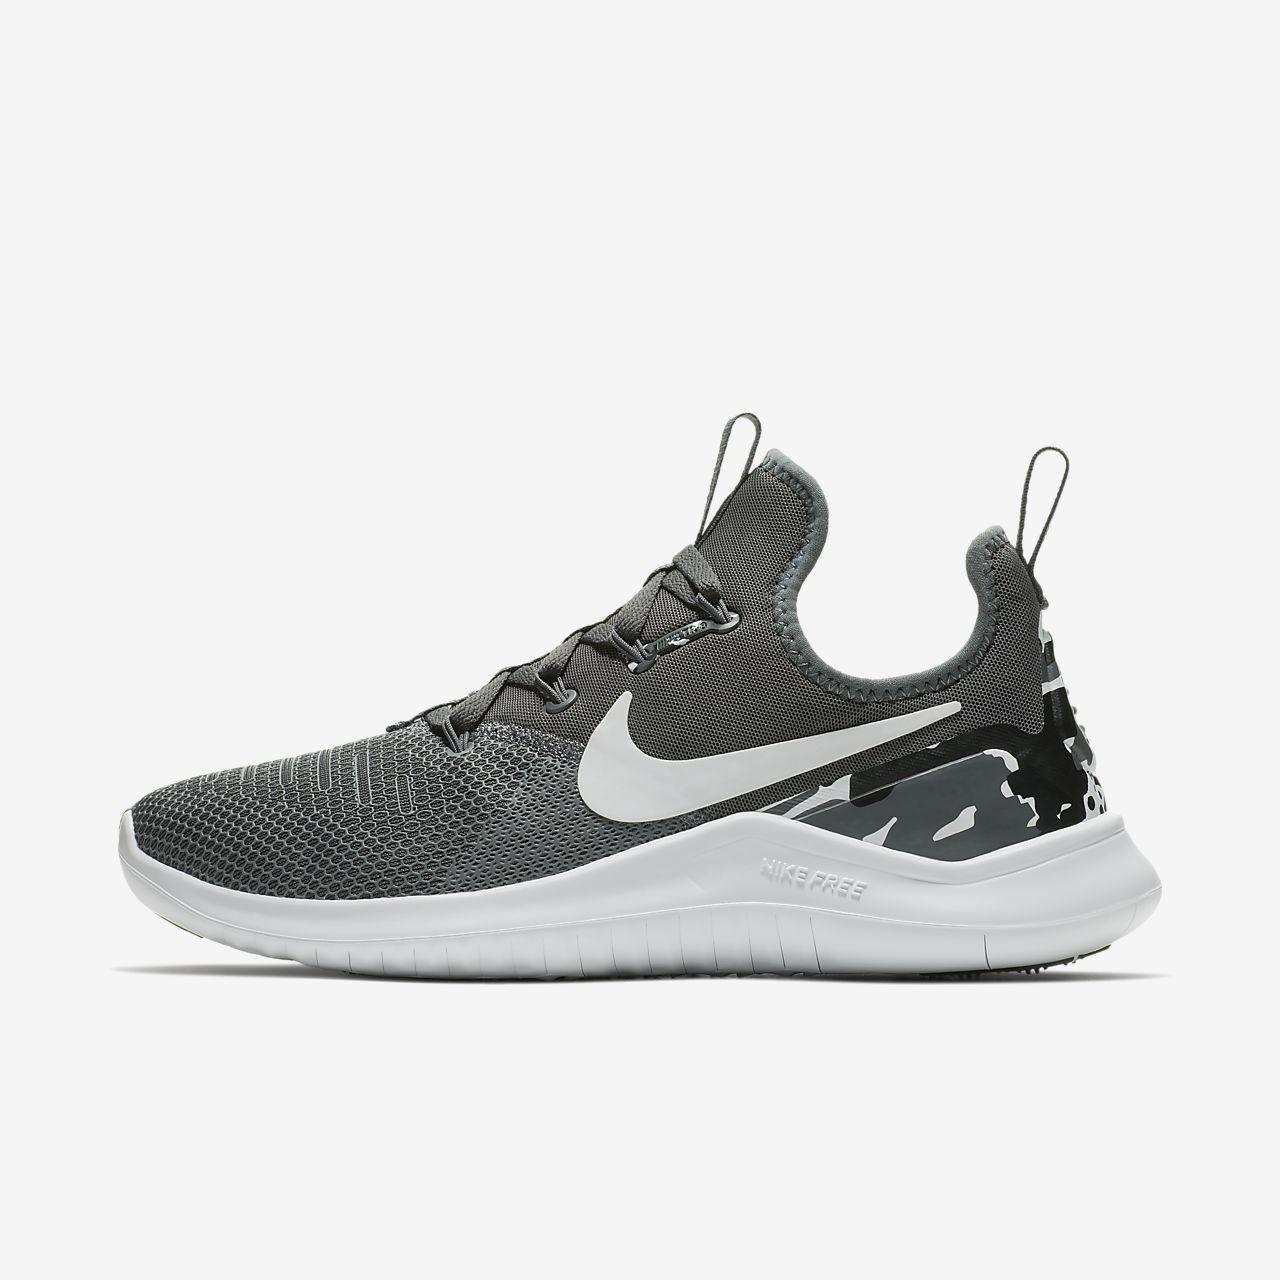 Nike Women's Free Tr 8 Lace Up Sneakers w7fAe